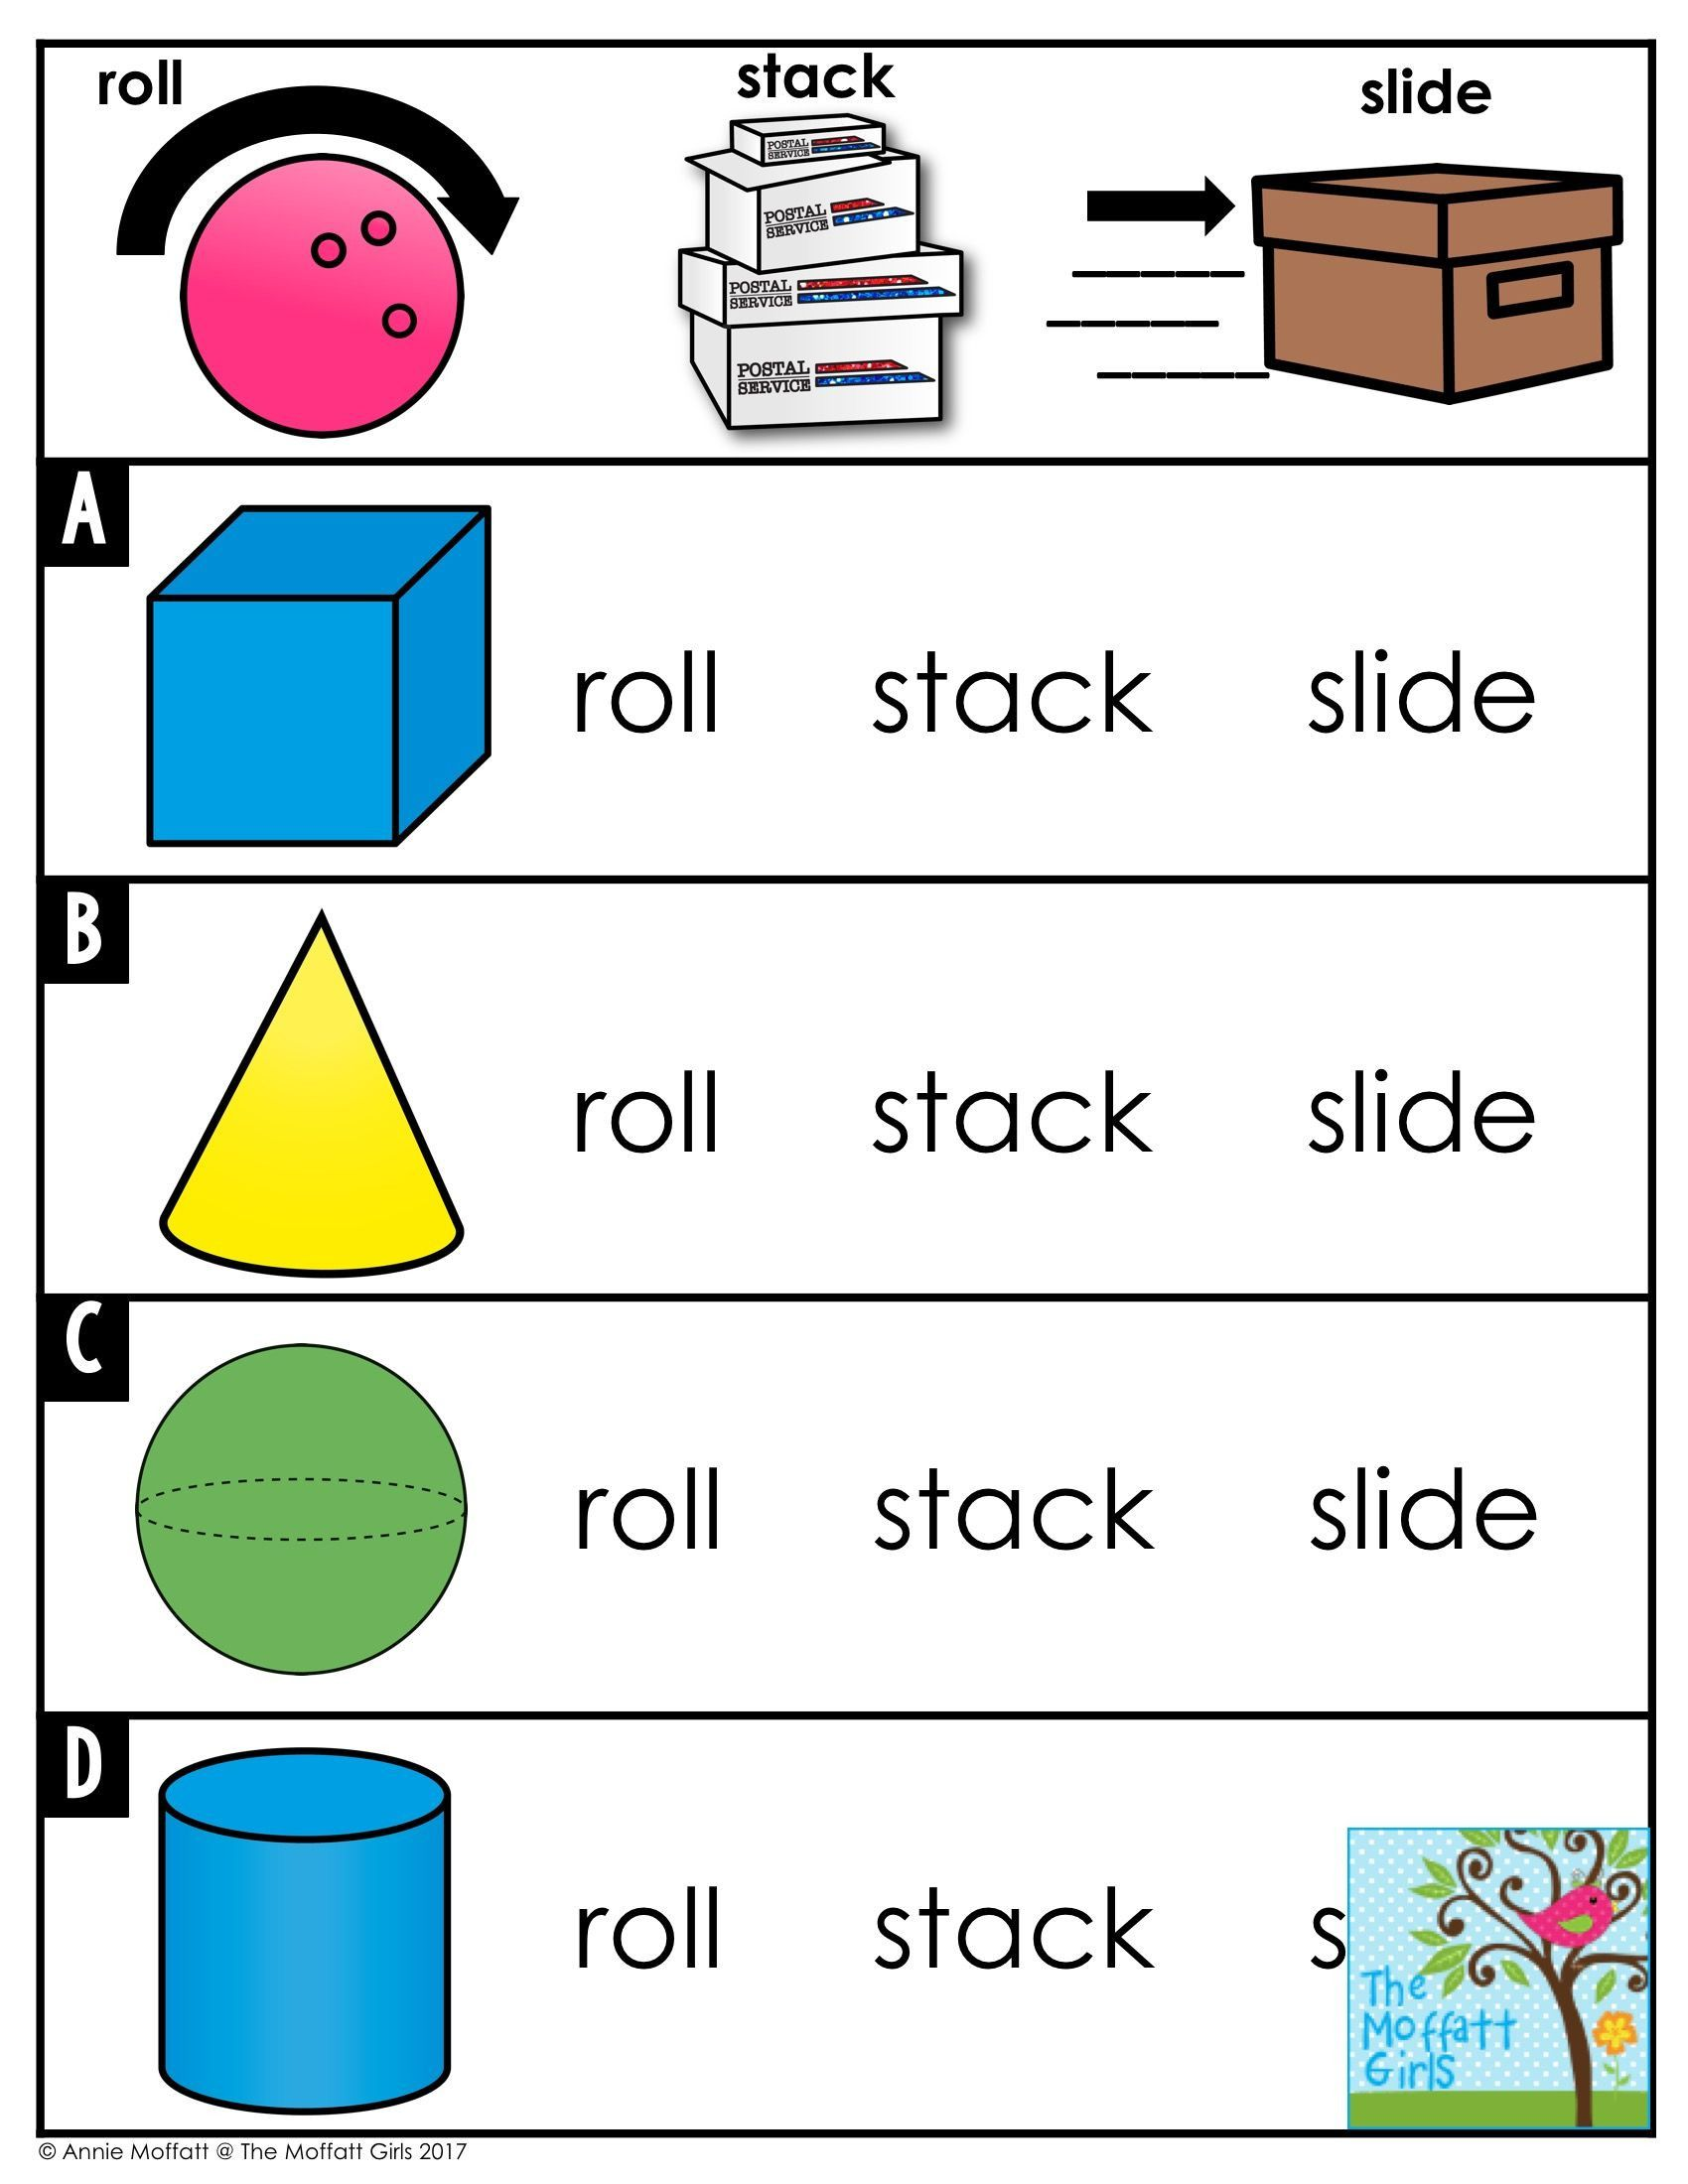 3d Shapes Worksheet Kinder   Printable Worksheets and Activities for  Teachers [ 2200 x 1700 Pixel ]